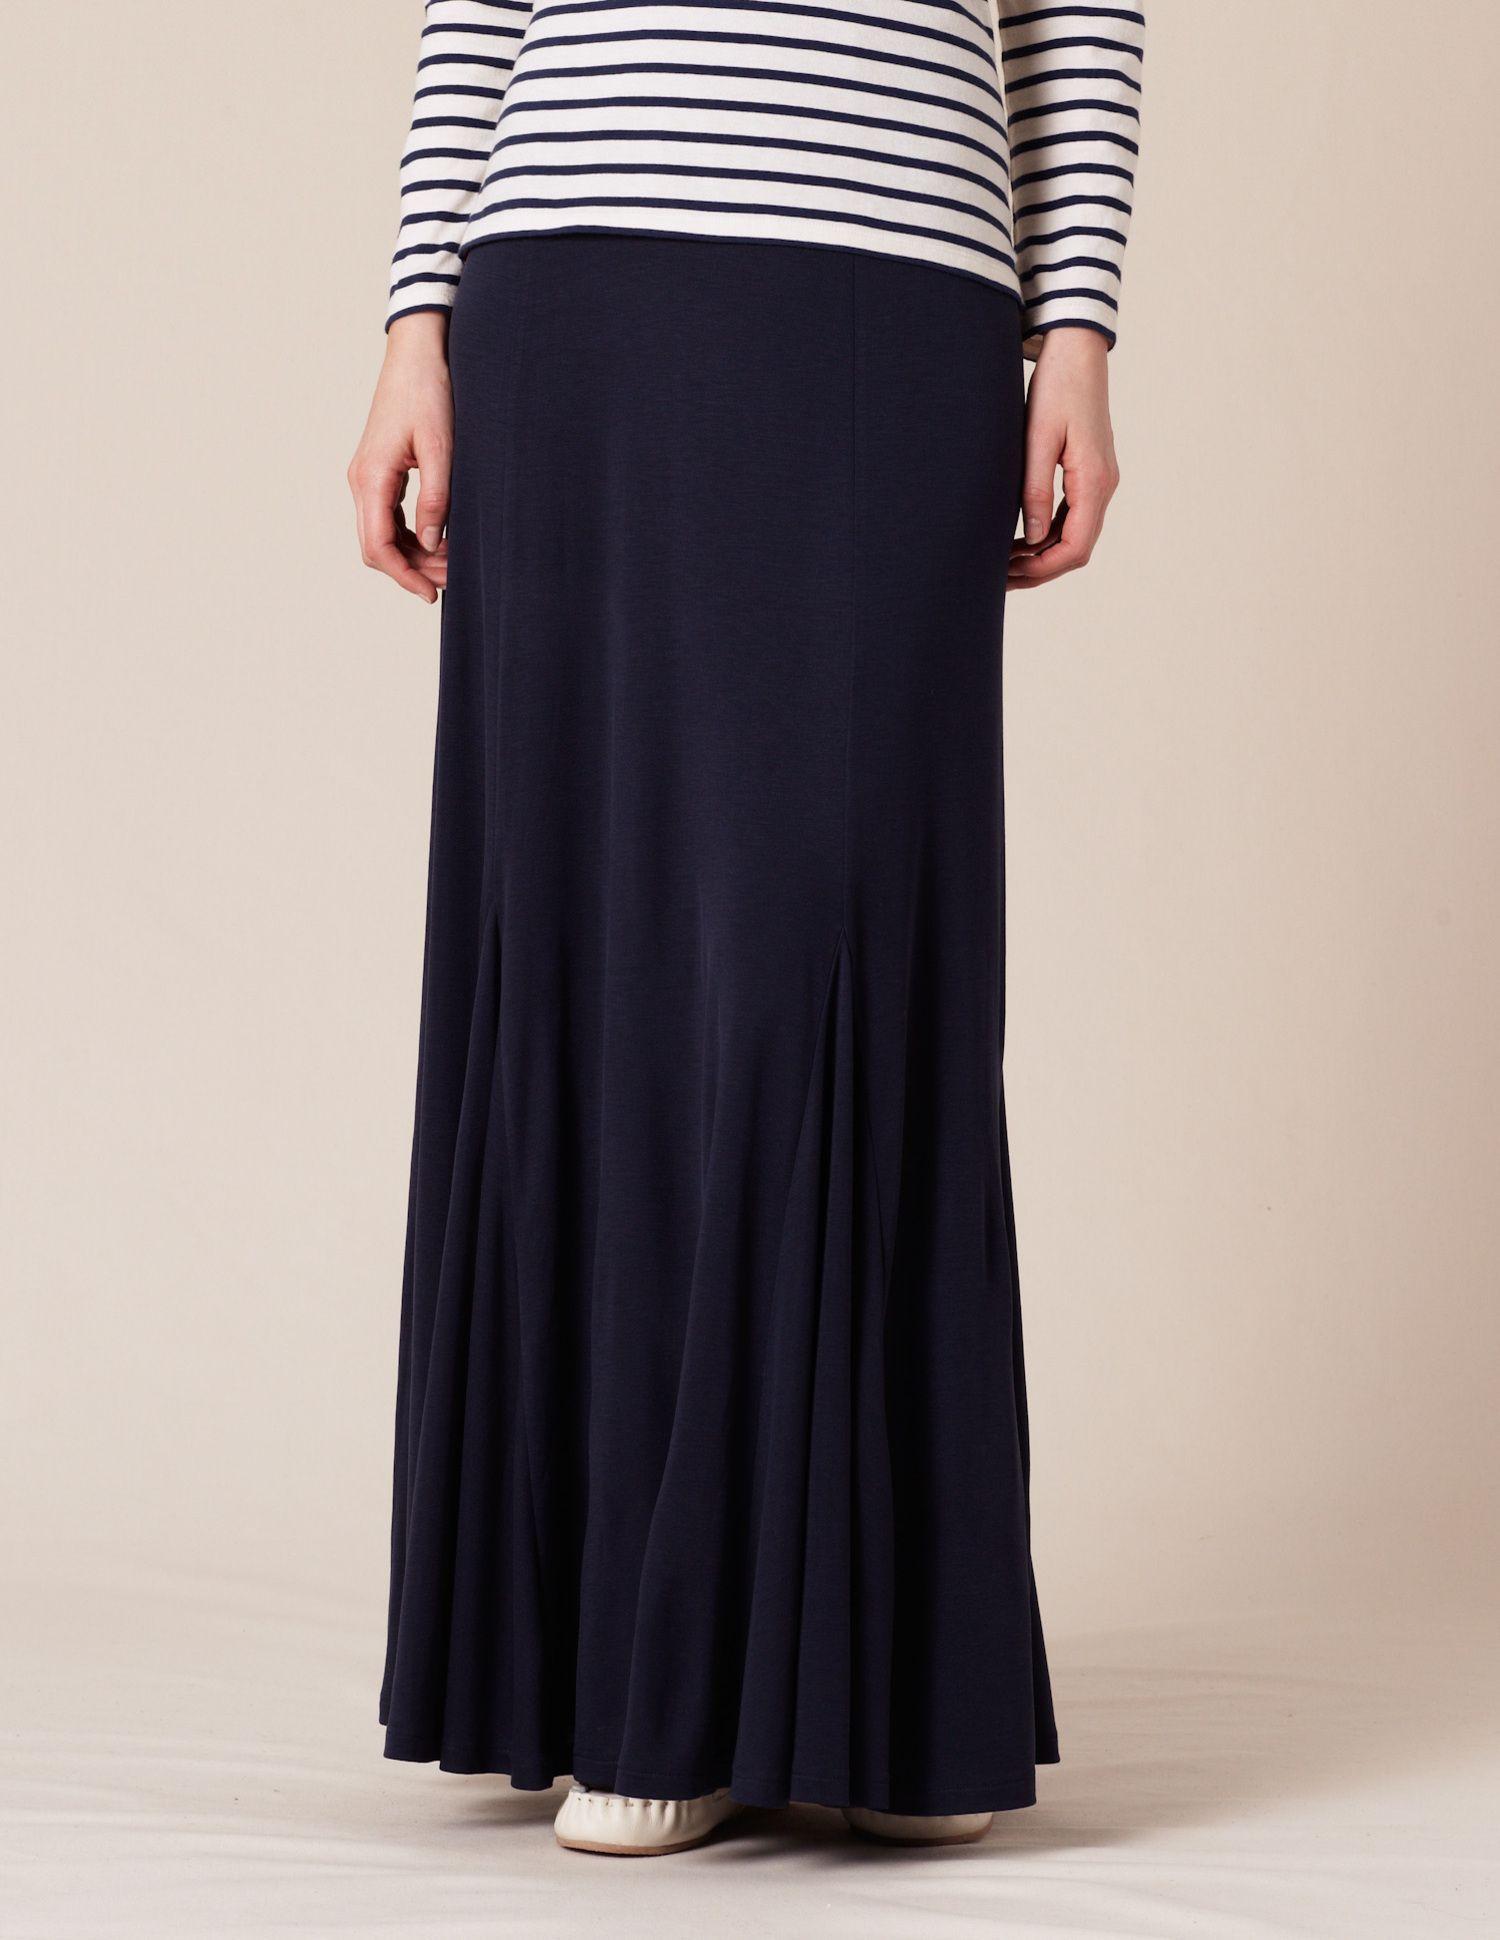 $88 Swishy Maxi Skirt | Style | Pinterest | Maxis, Skirts and Maxi ...